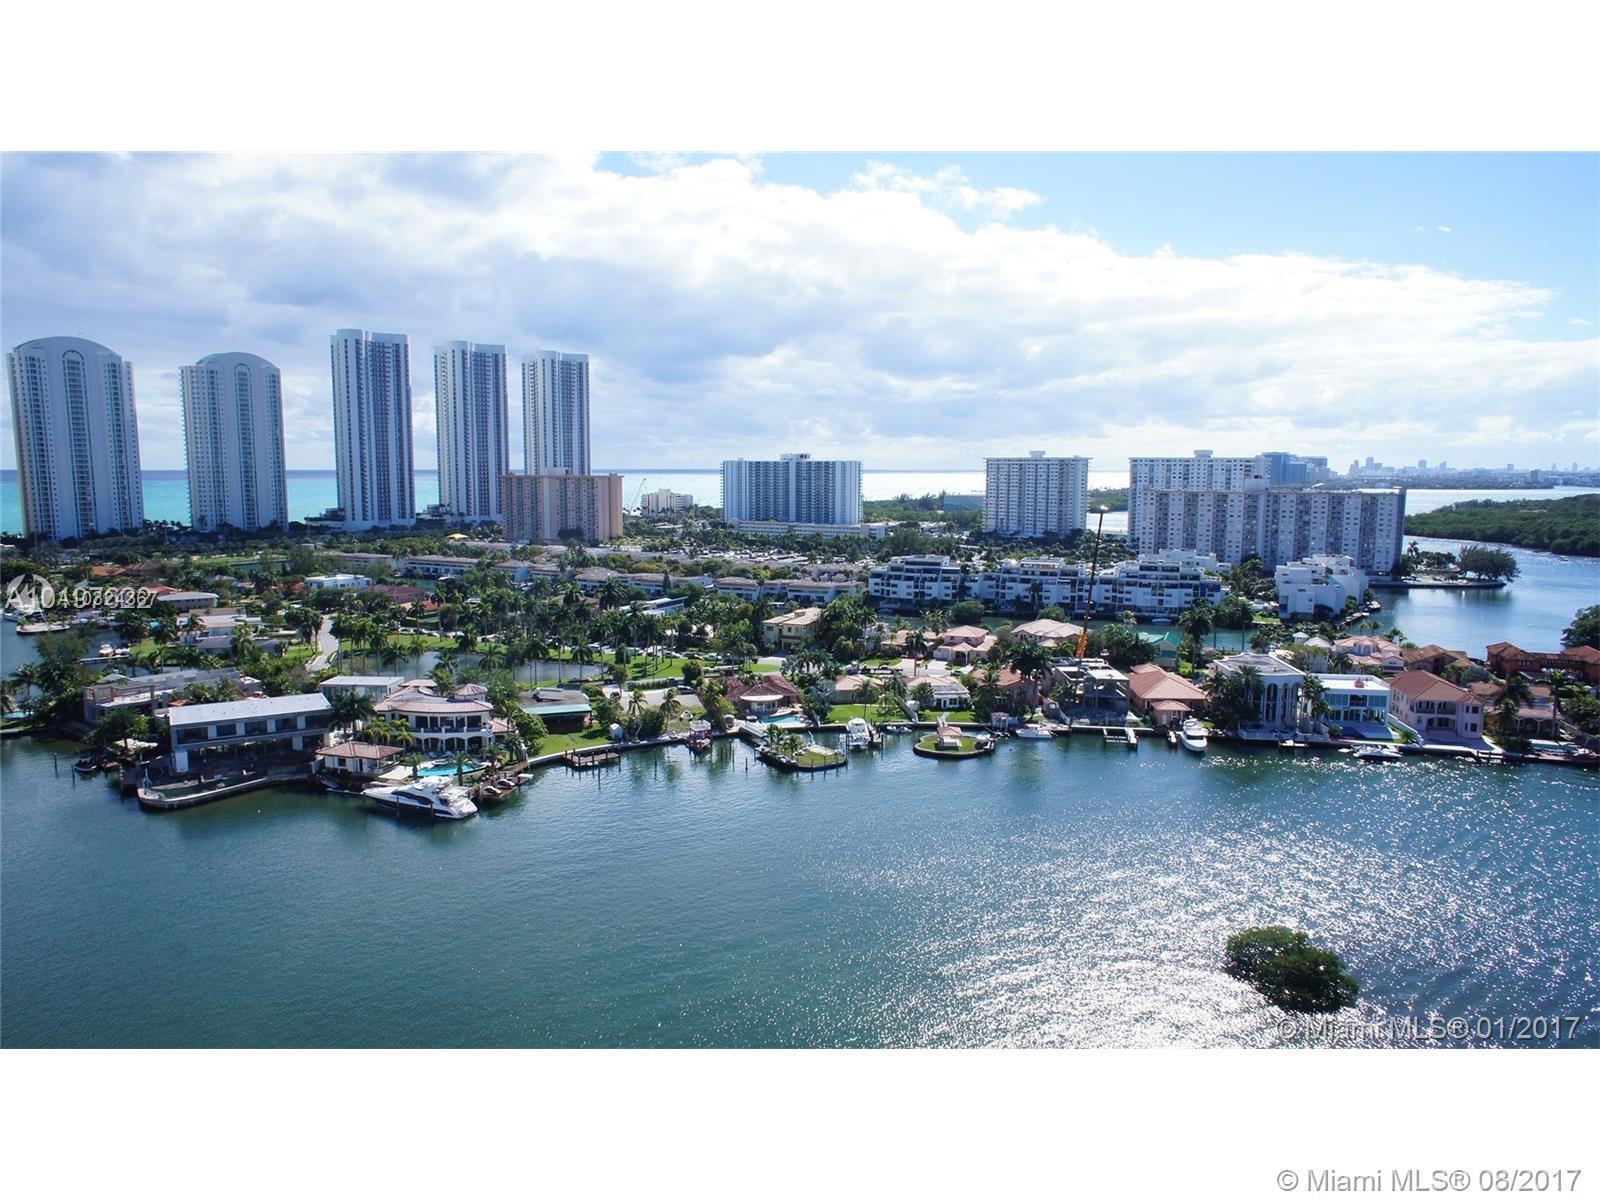 400 Sunny Isles #1201 - 400 Sunny Isles Blvd #1201, Sunny Isles Beach, FL 33160